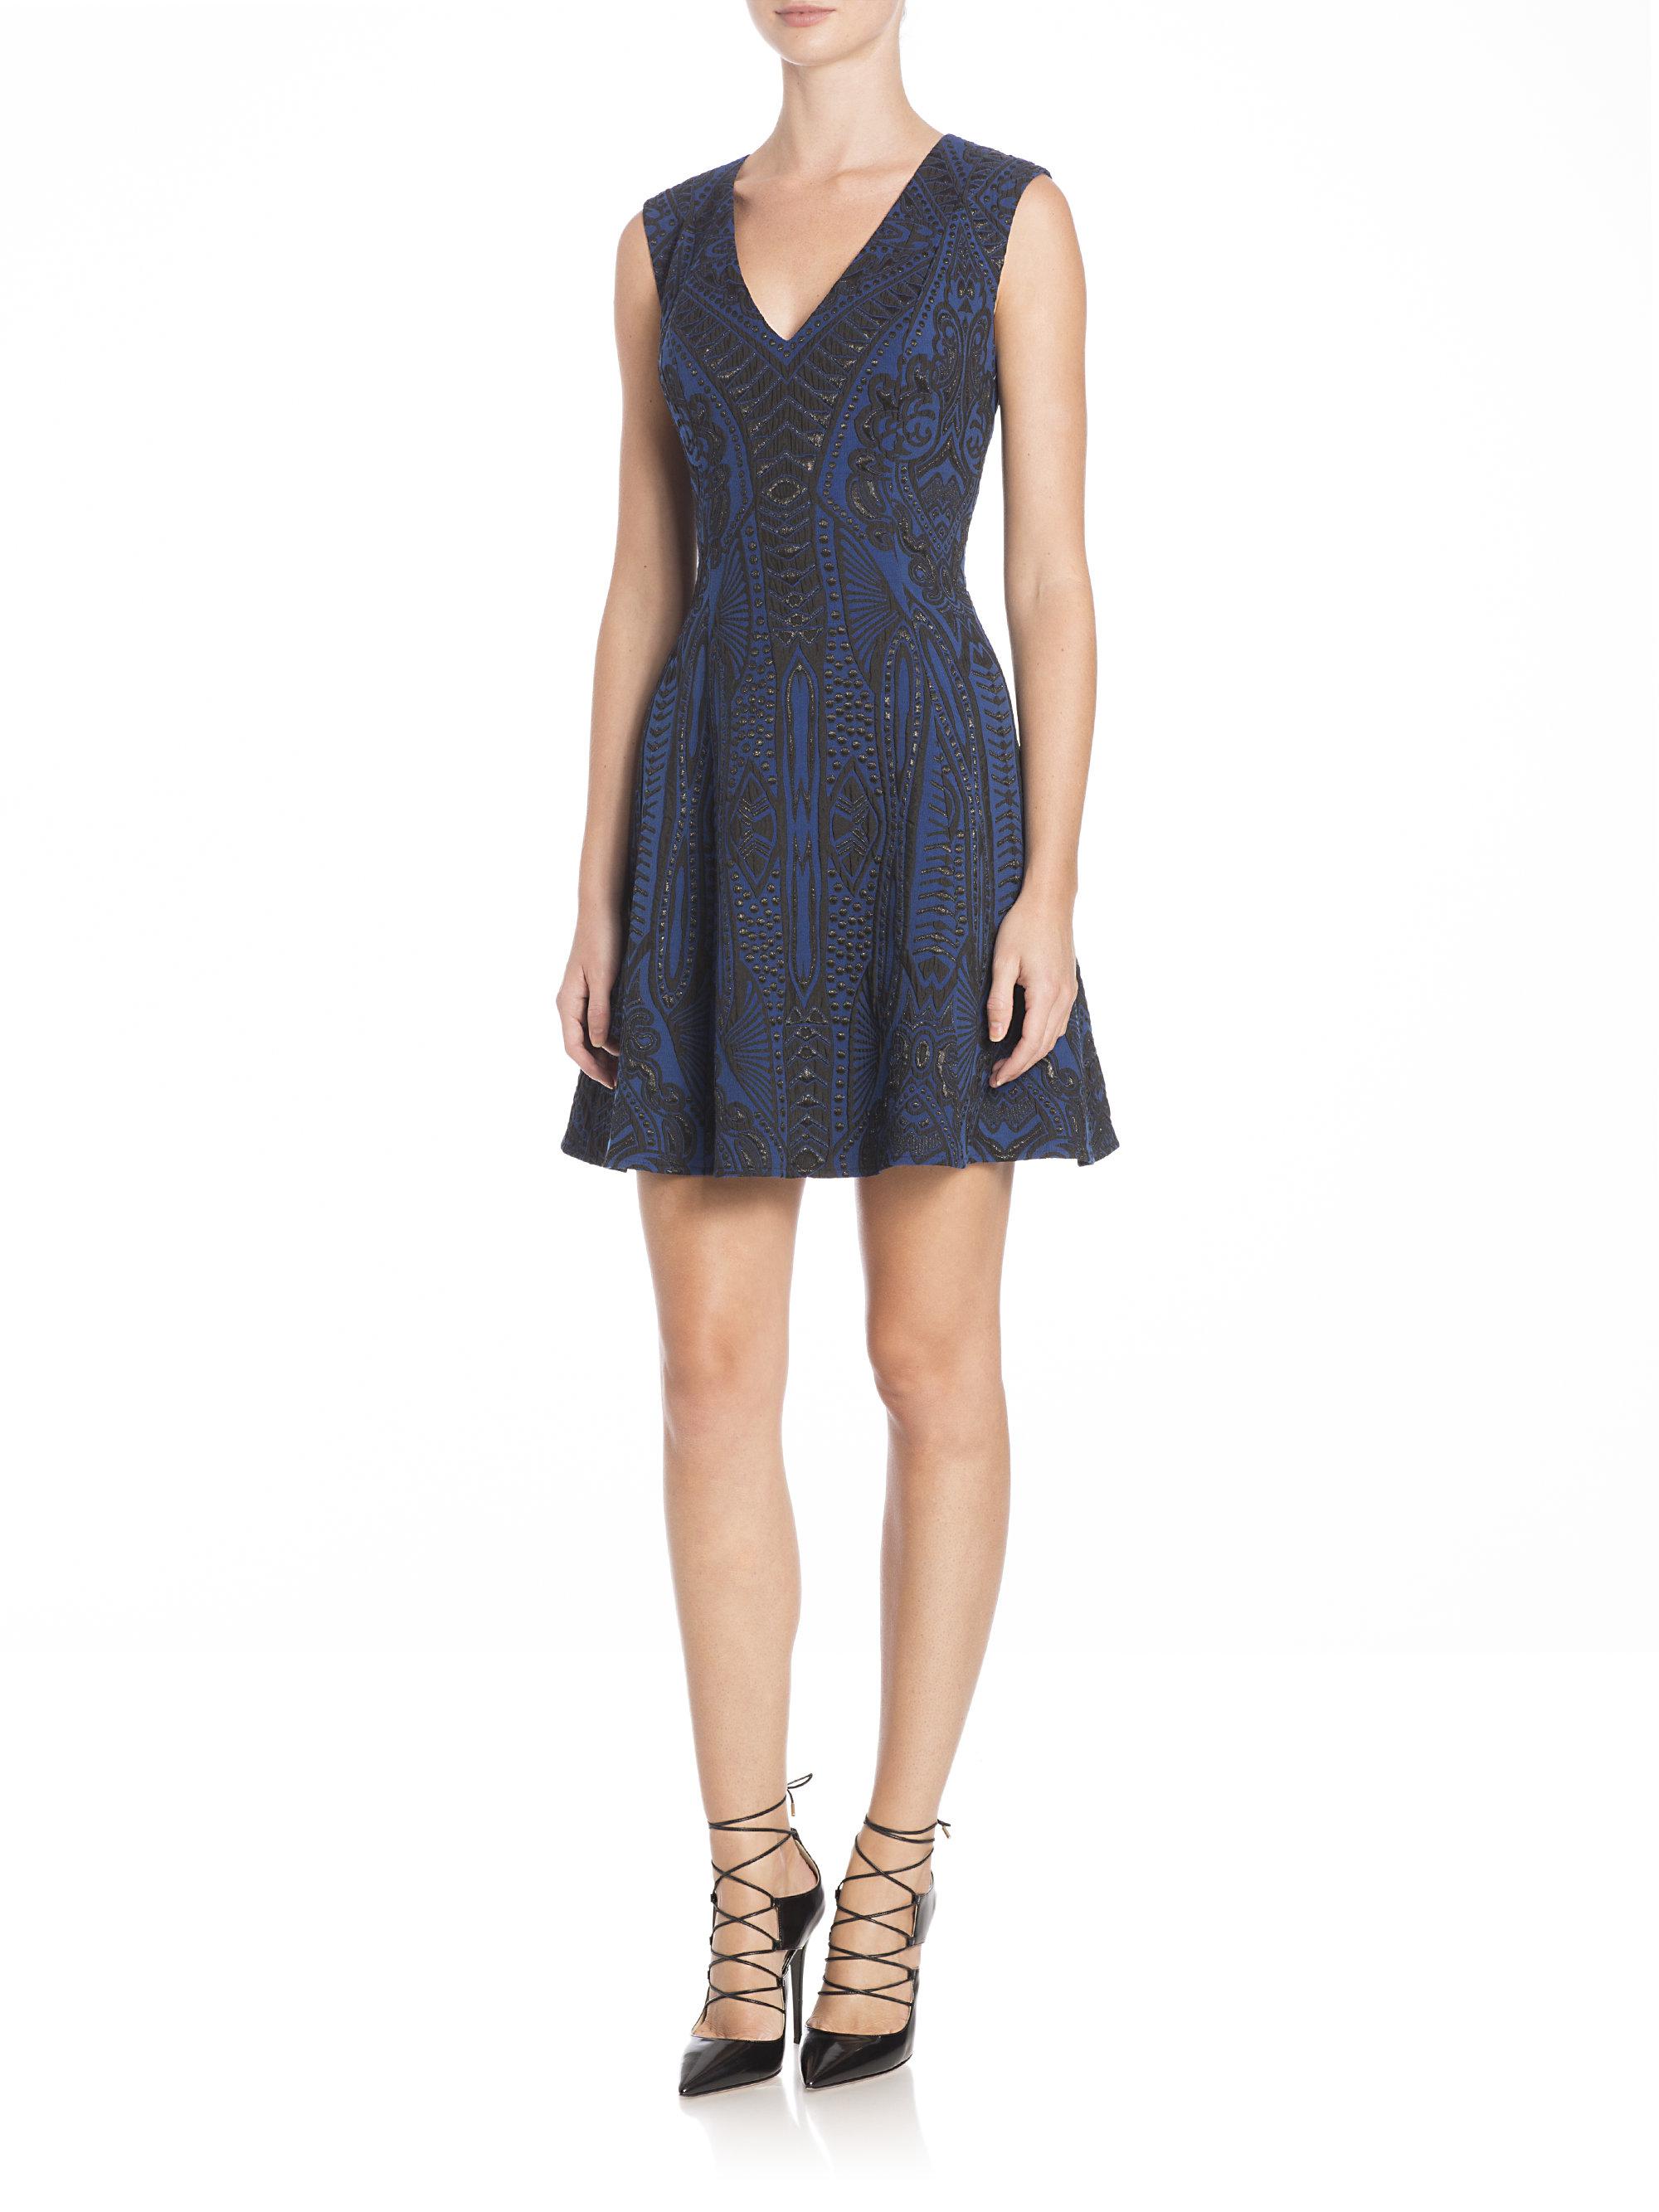 Bcbgmaxazria Synthetic Hannelli Jacquard Fit Amp Flare Dress